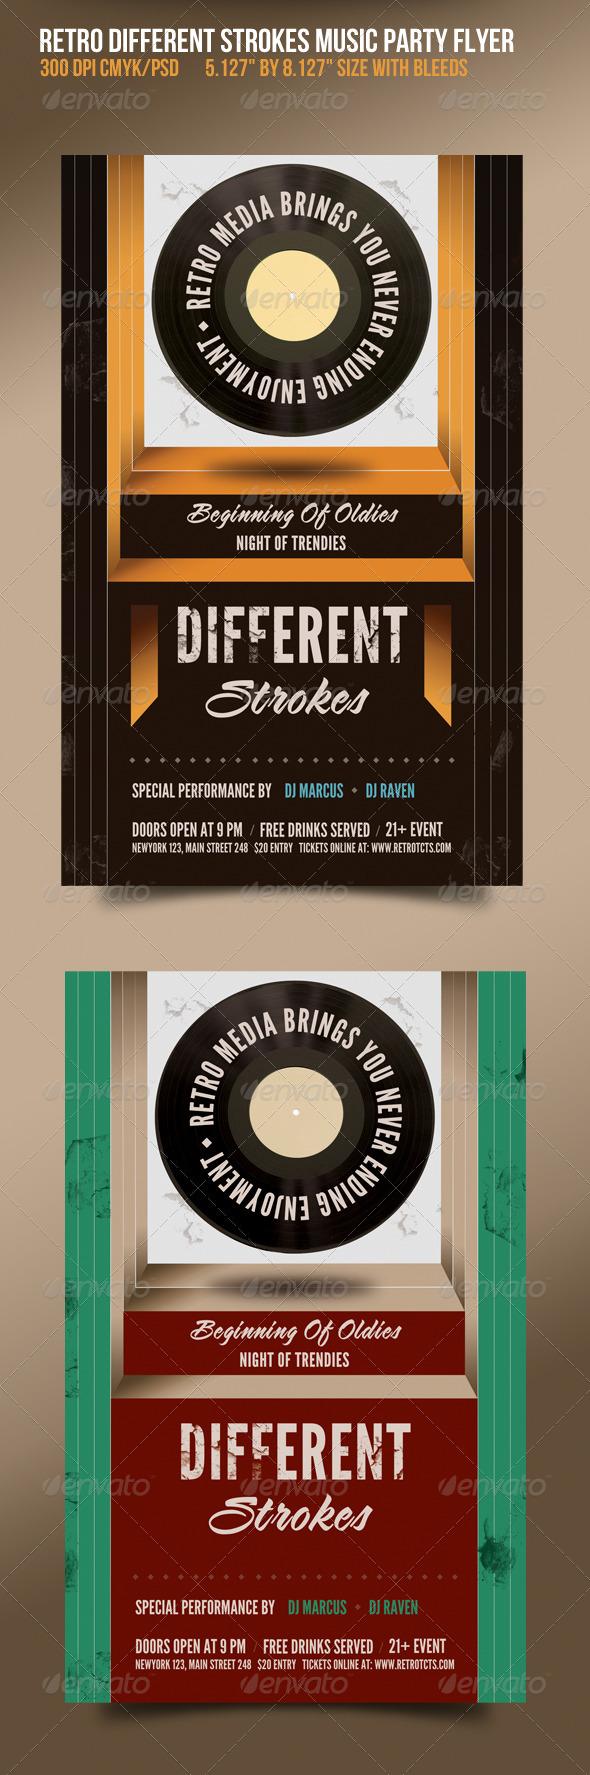 GraphicRiver Different Strokes Retro Music Dance Party Flyer 1575659